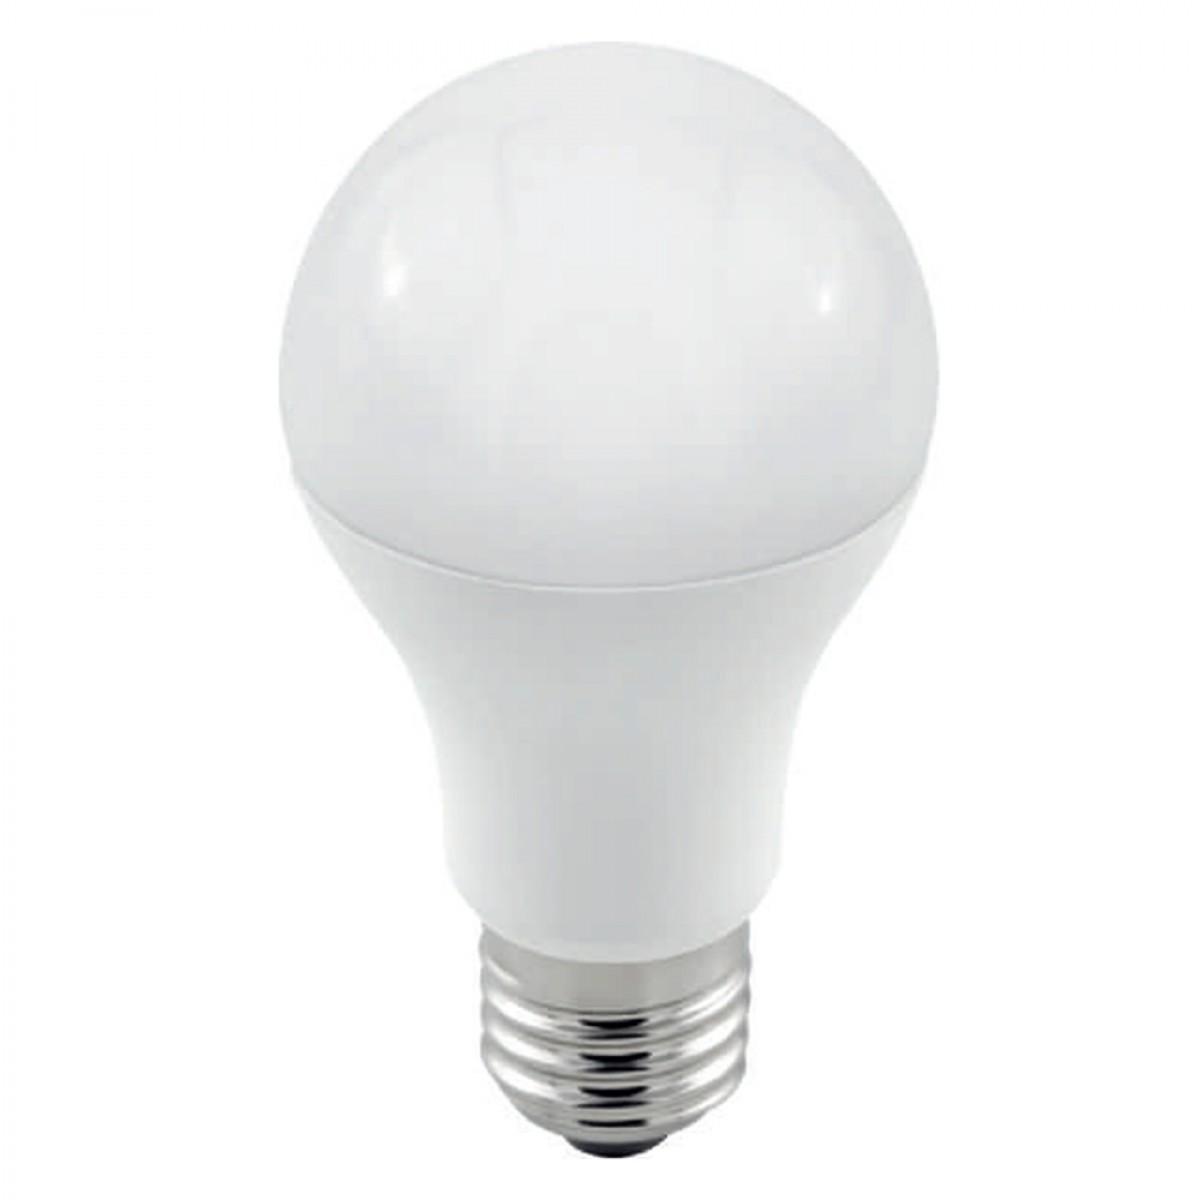 Lampada de Led 9w Bulbo Soquete E27 Branco Frio Bivolt